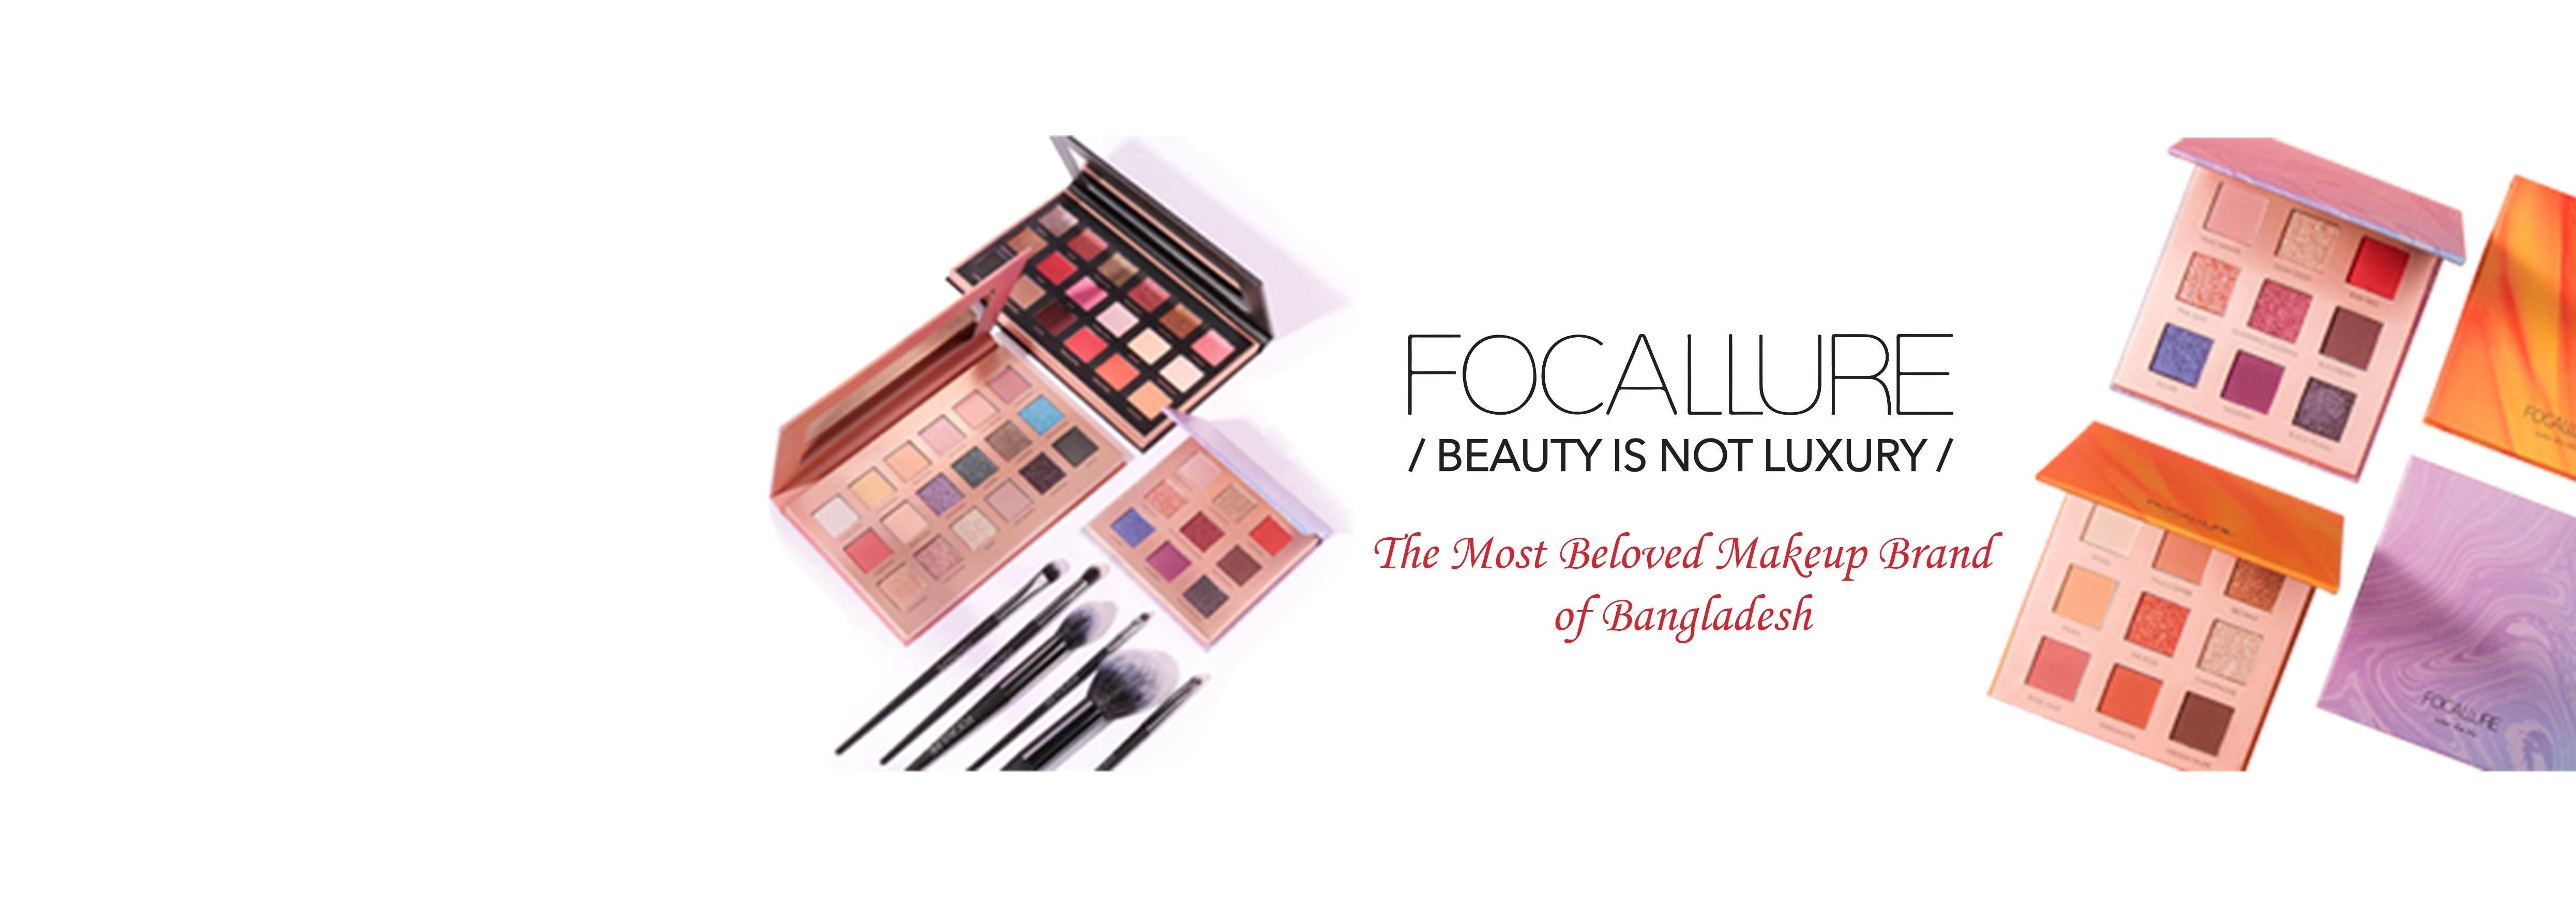 Focallure Bangladesh. Liquid Lipsticks. Eye Shadow